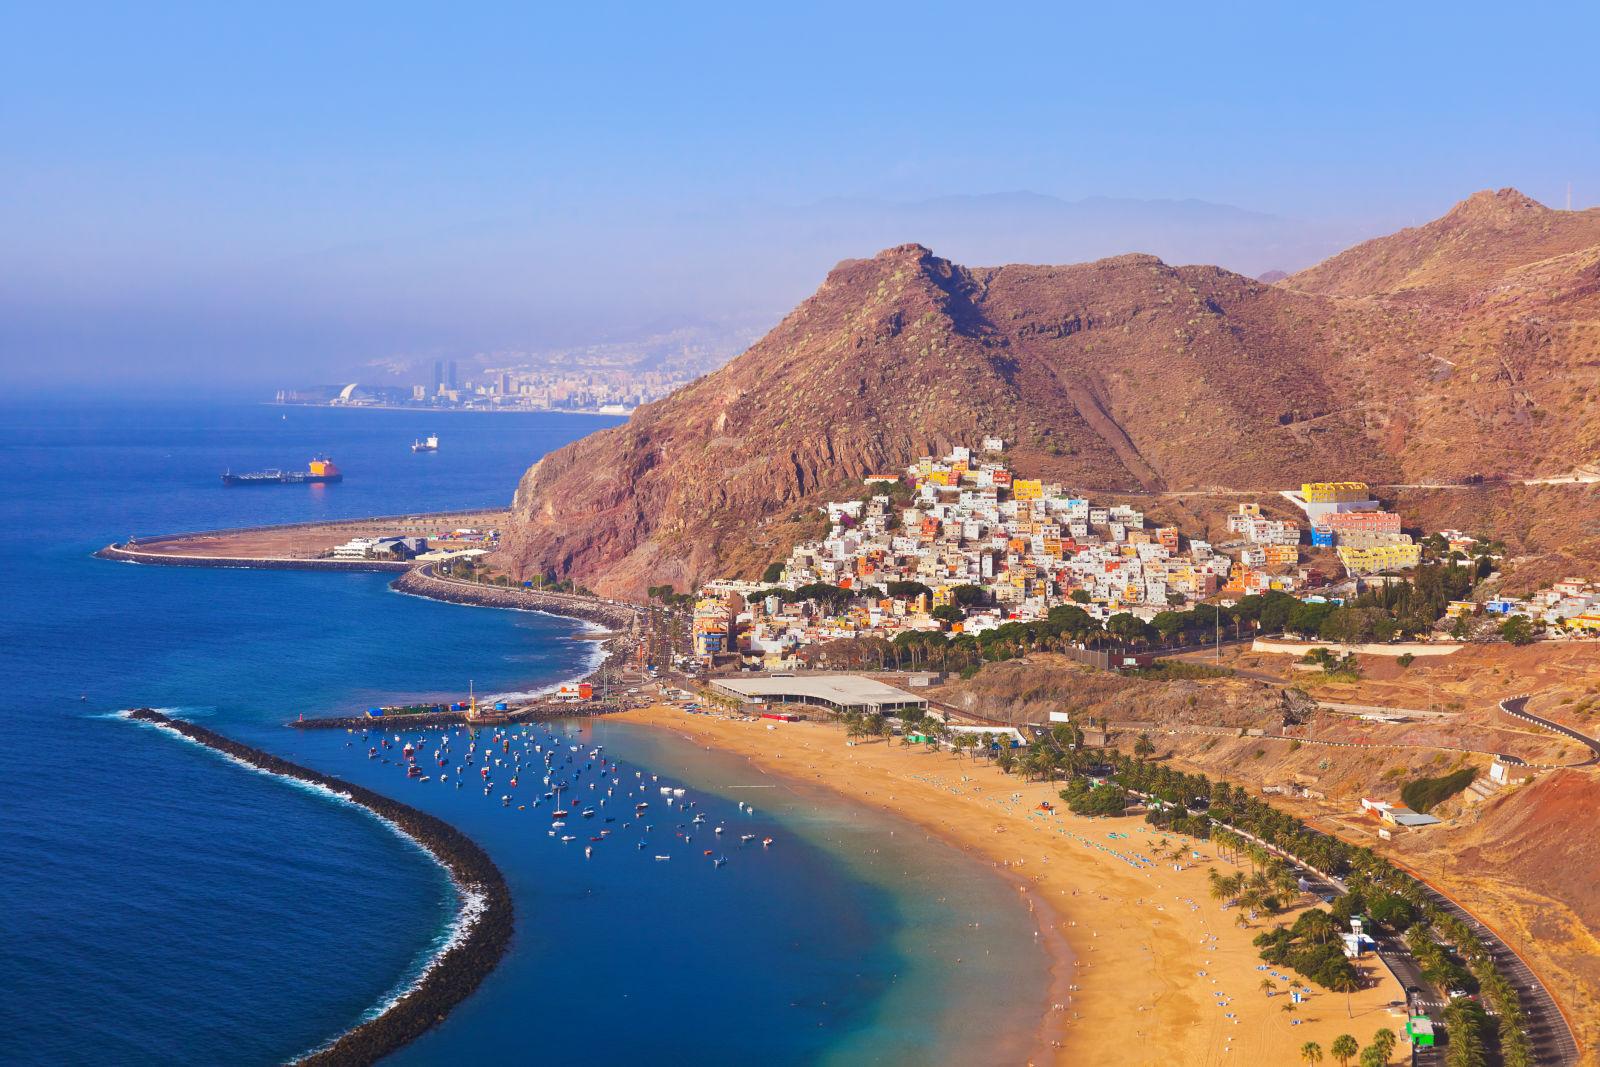 Aerial View, Canary Islands, Coast